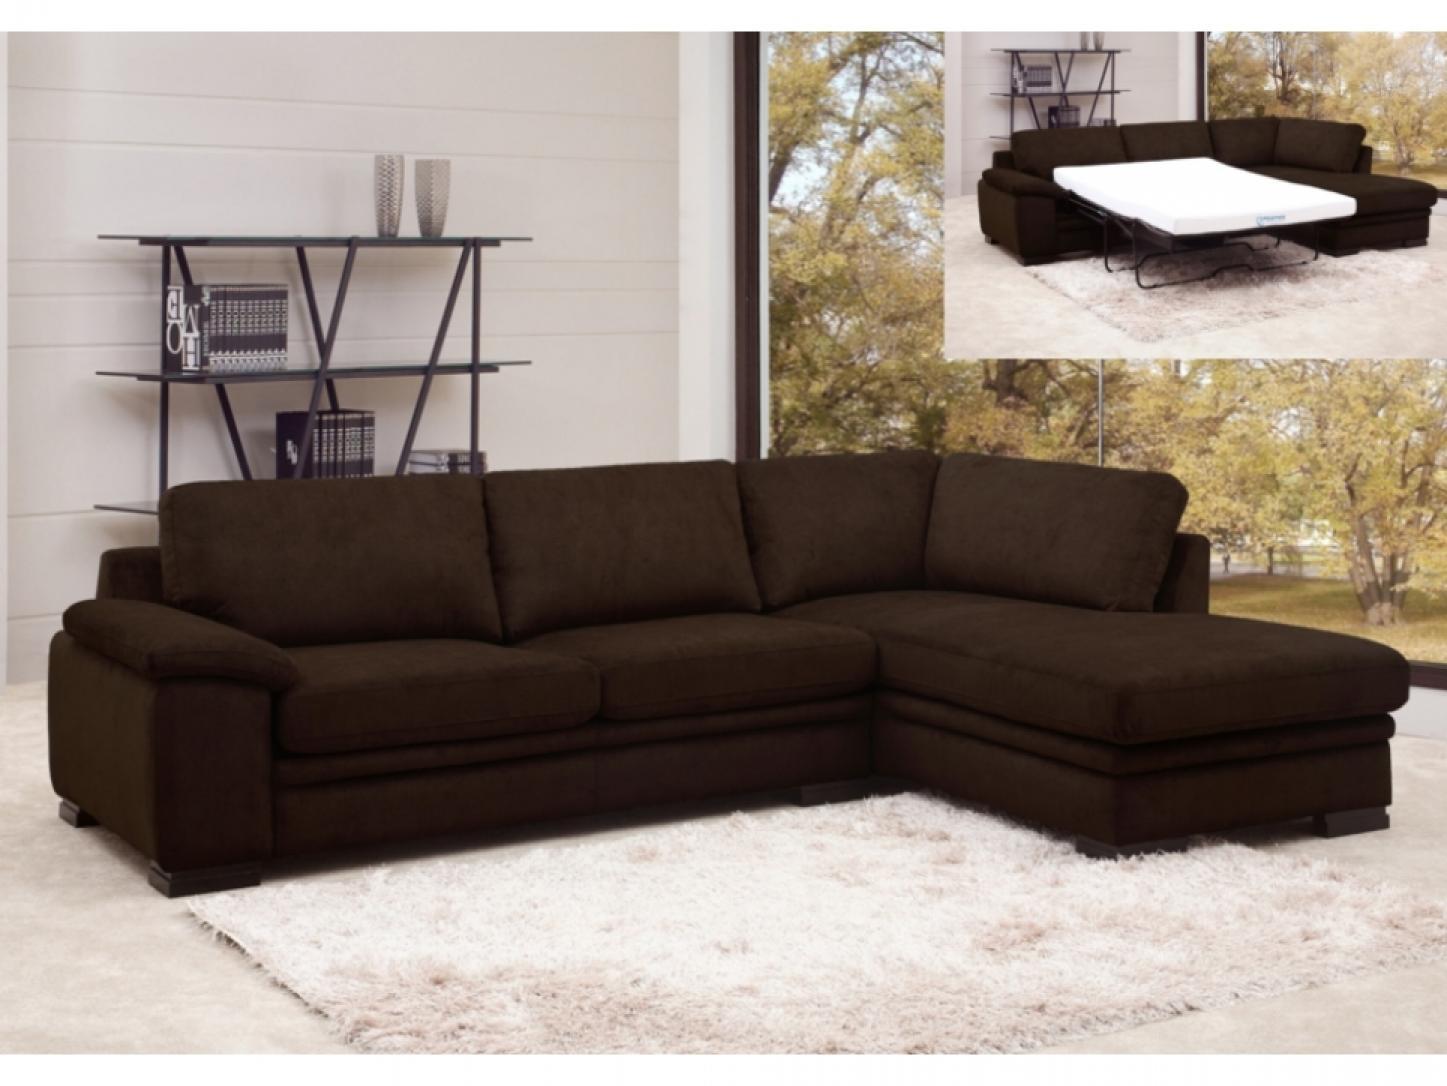 photos canap convertible d 39 angle. Black Bedroom Furniture Sets. Home Design Ideas